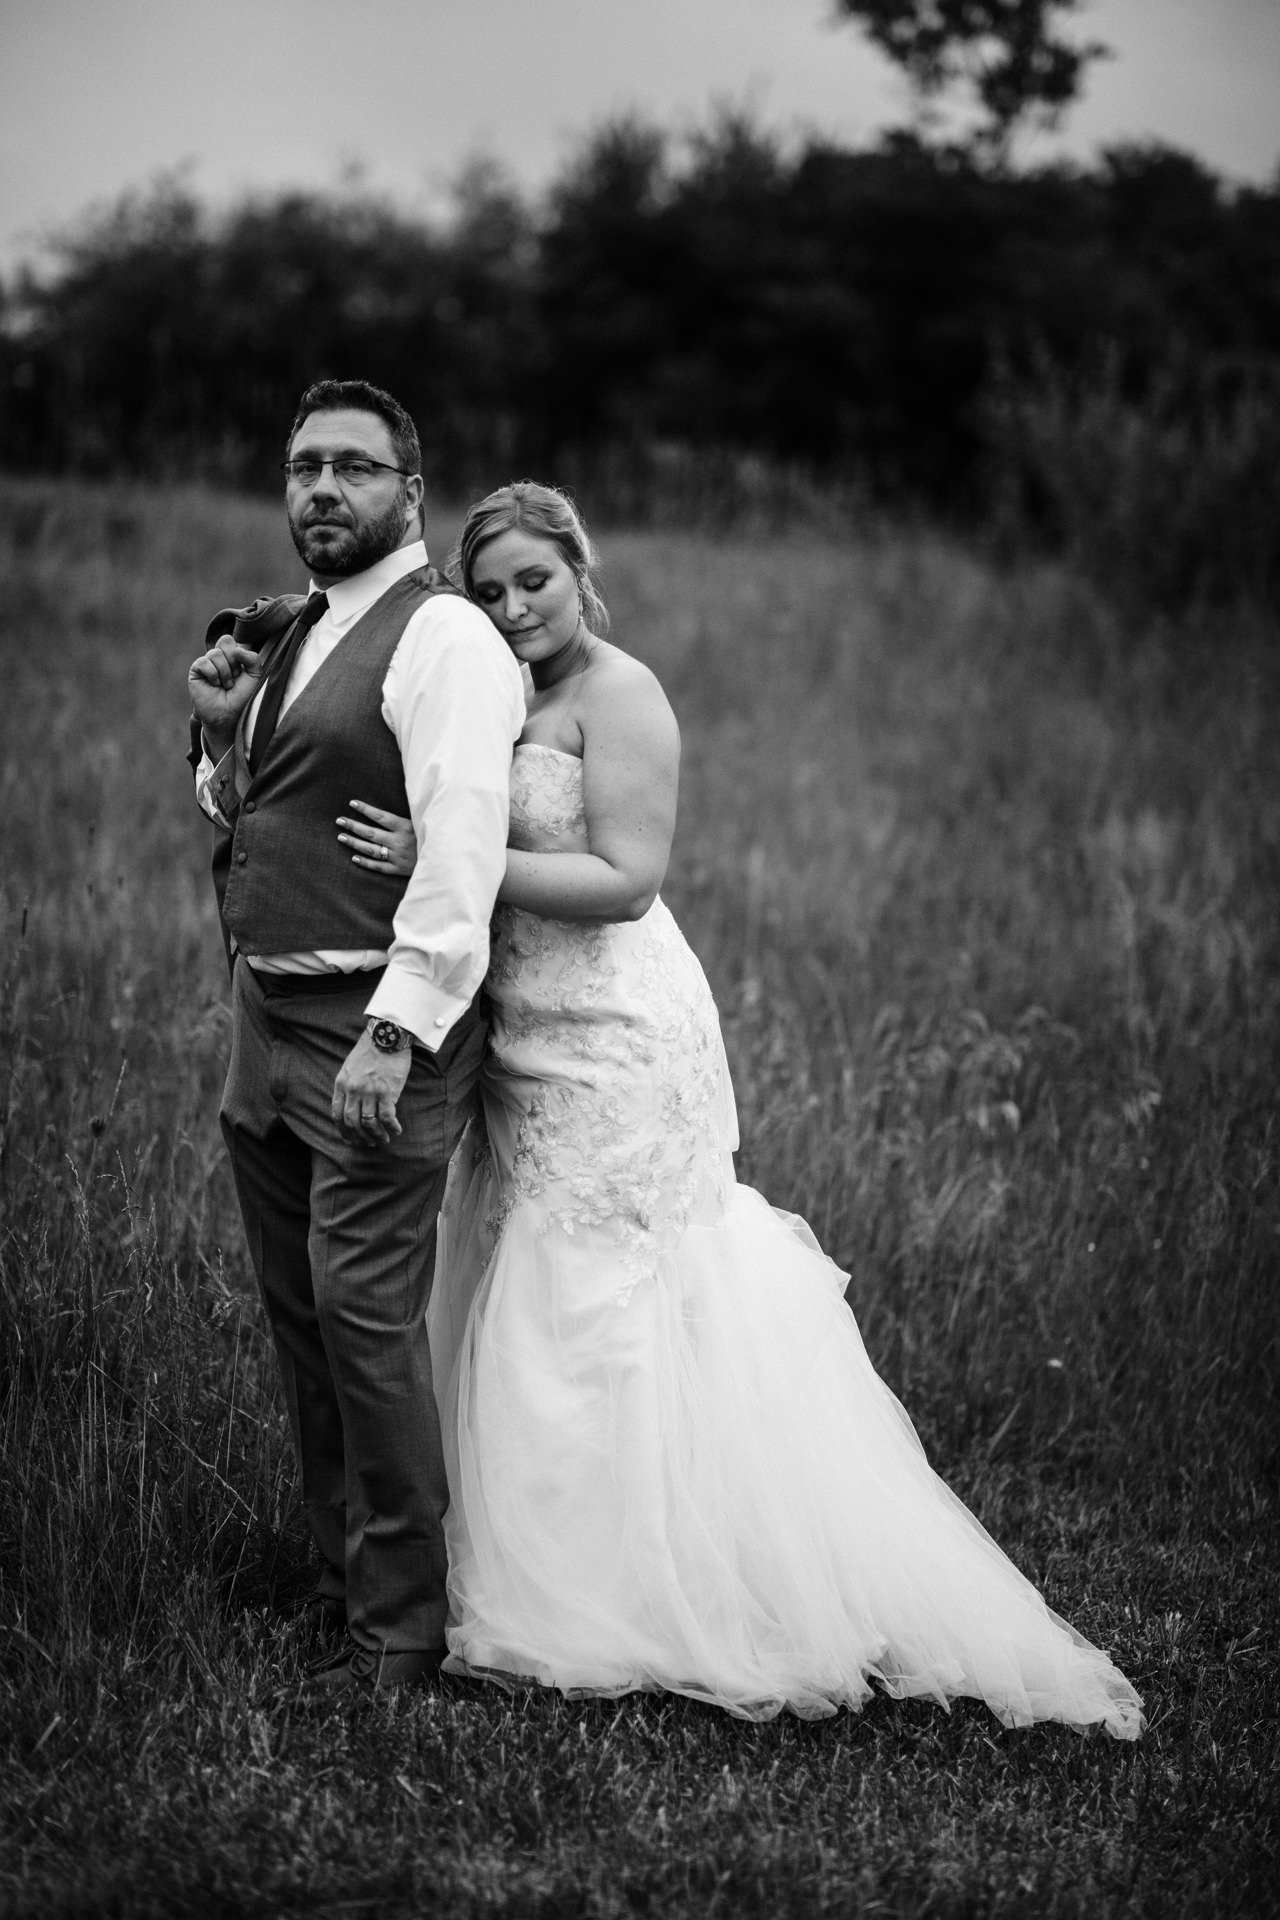 Grant Beachy Weddings photography elkhart south bend goshen warsaw-069.jpg